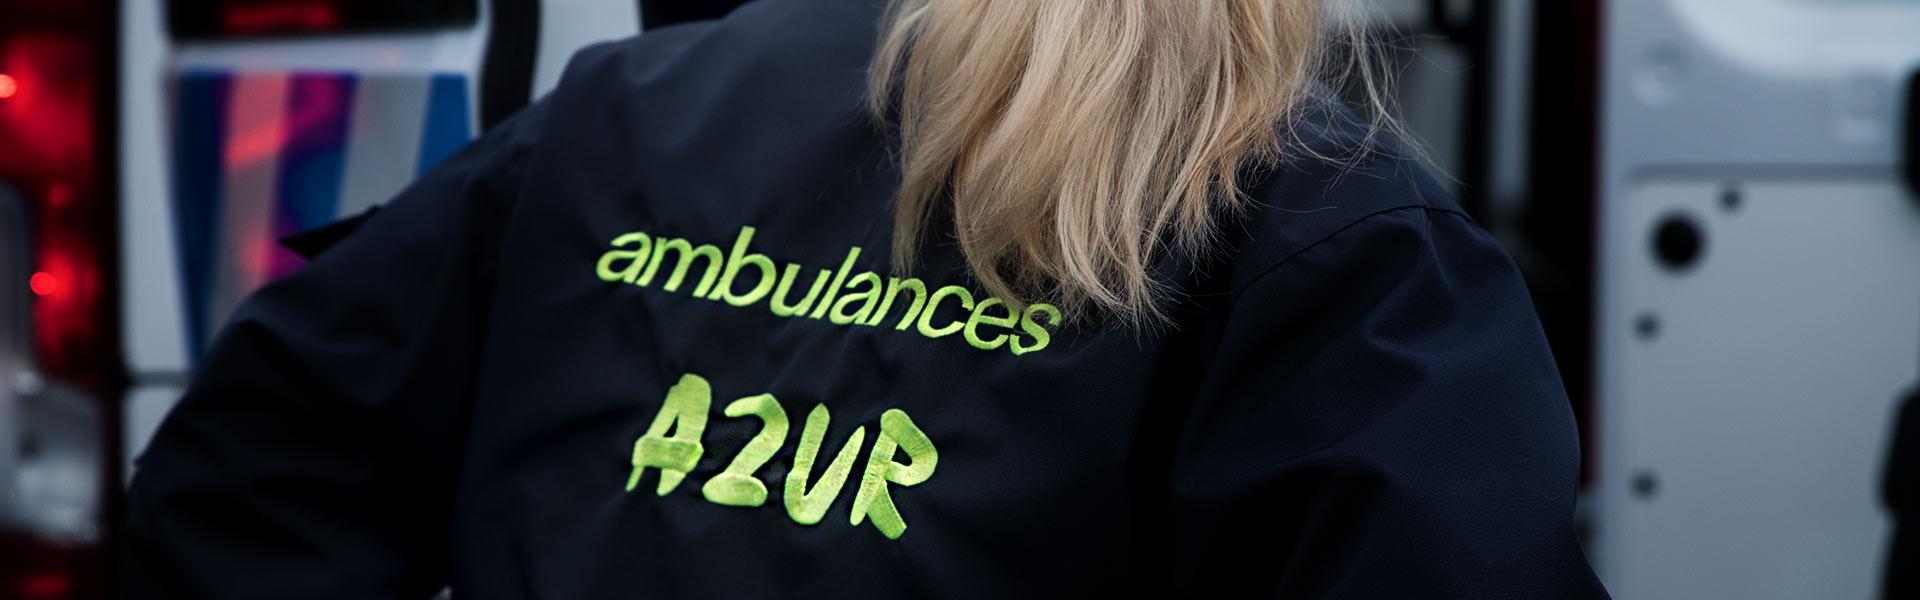 Ambulance-Azur-castres-02